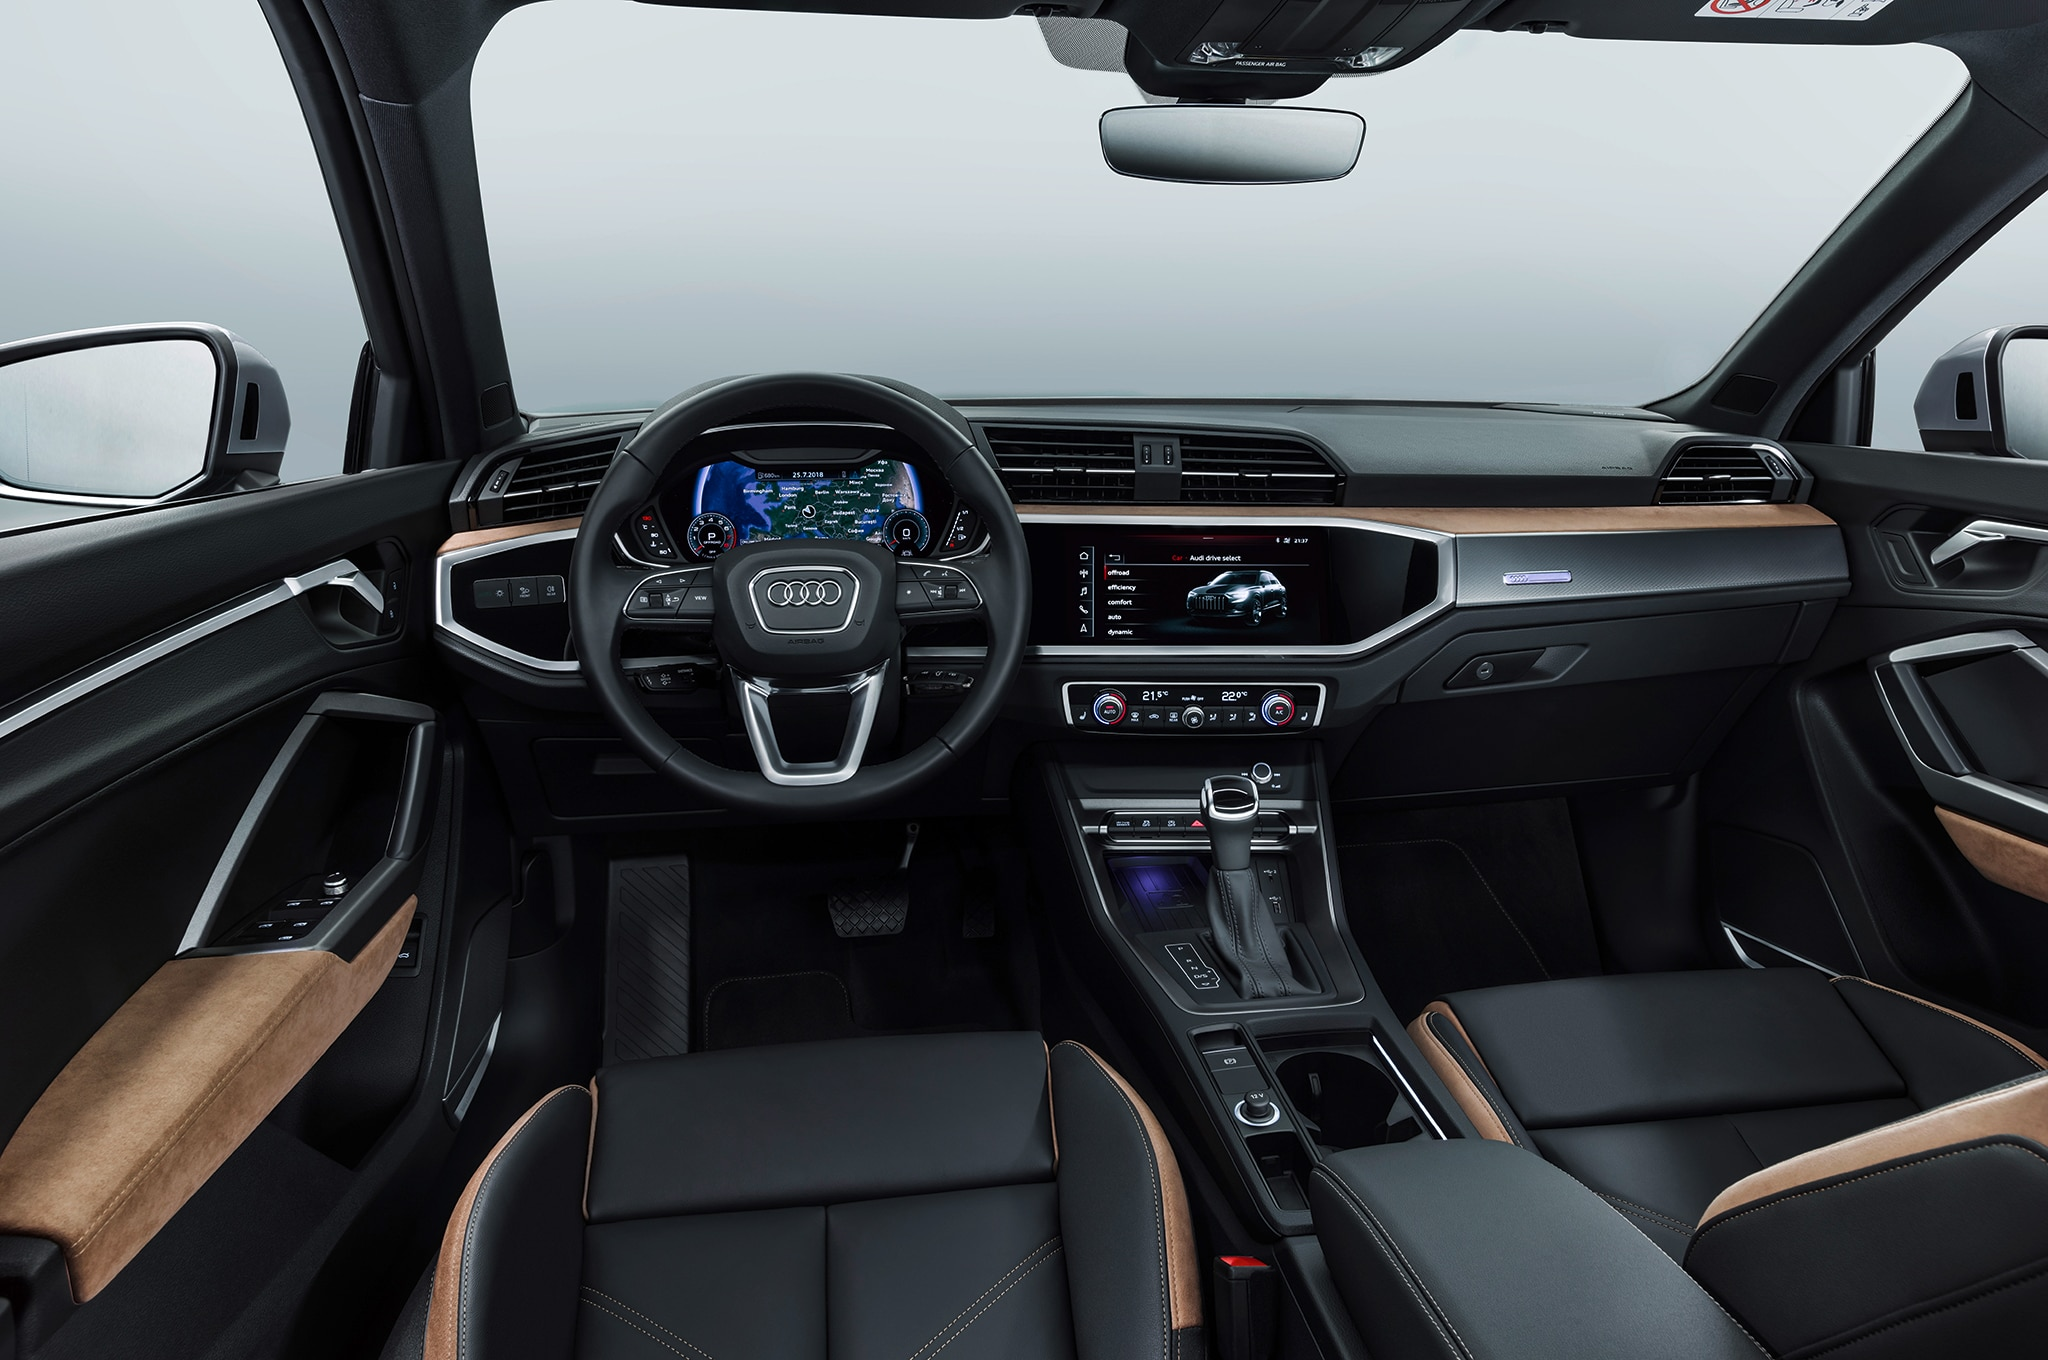 2019 Audi Q3 Dashboard